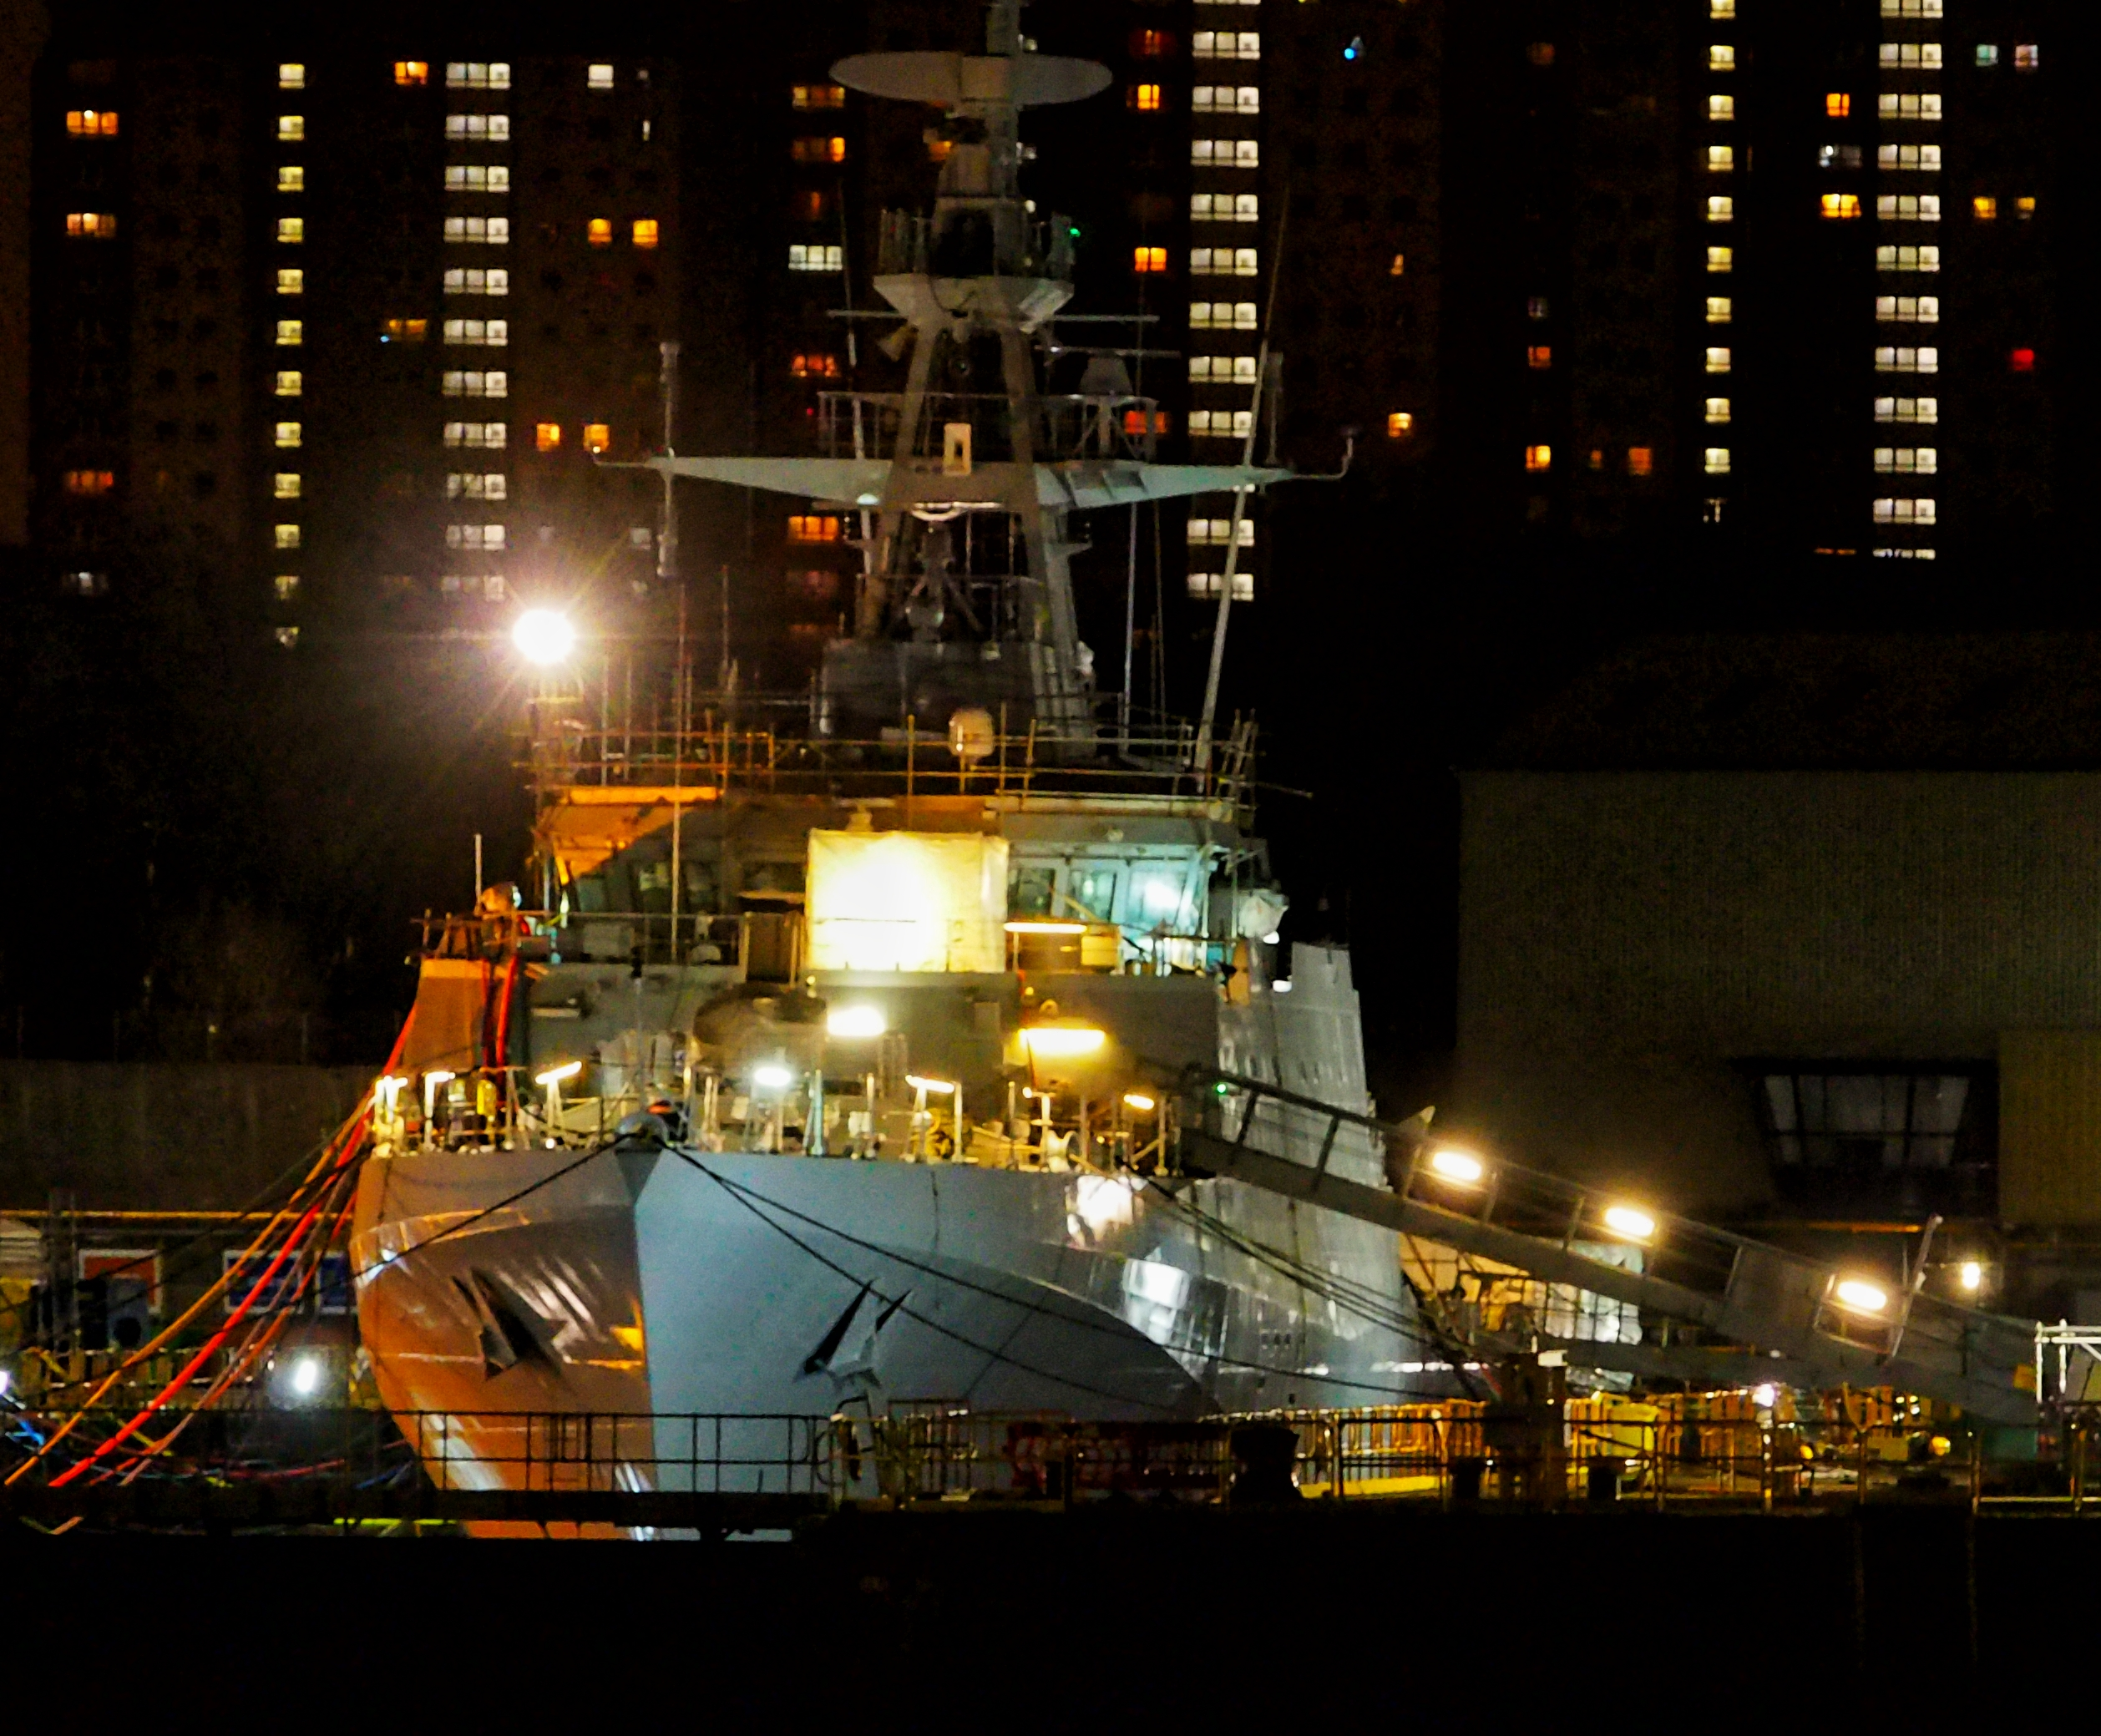 River-class Offshore Patrol Vessels (Batch 1 & 2) - Page 6 45648556105_57b721fa8e_o